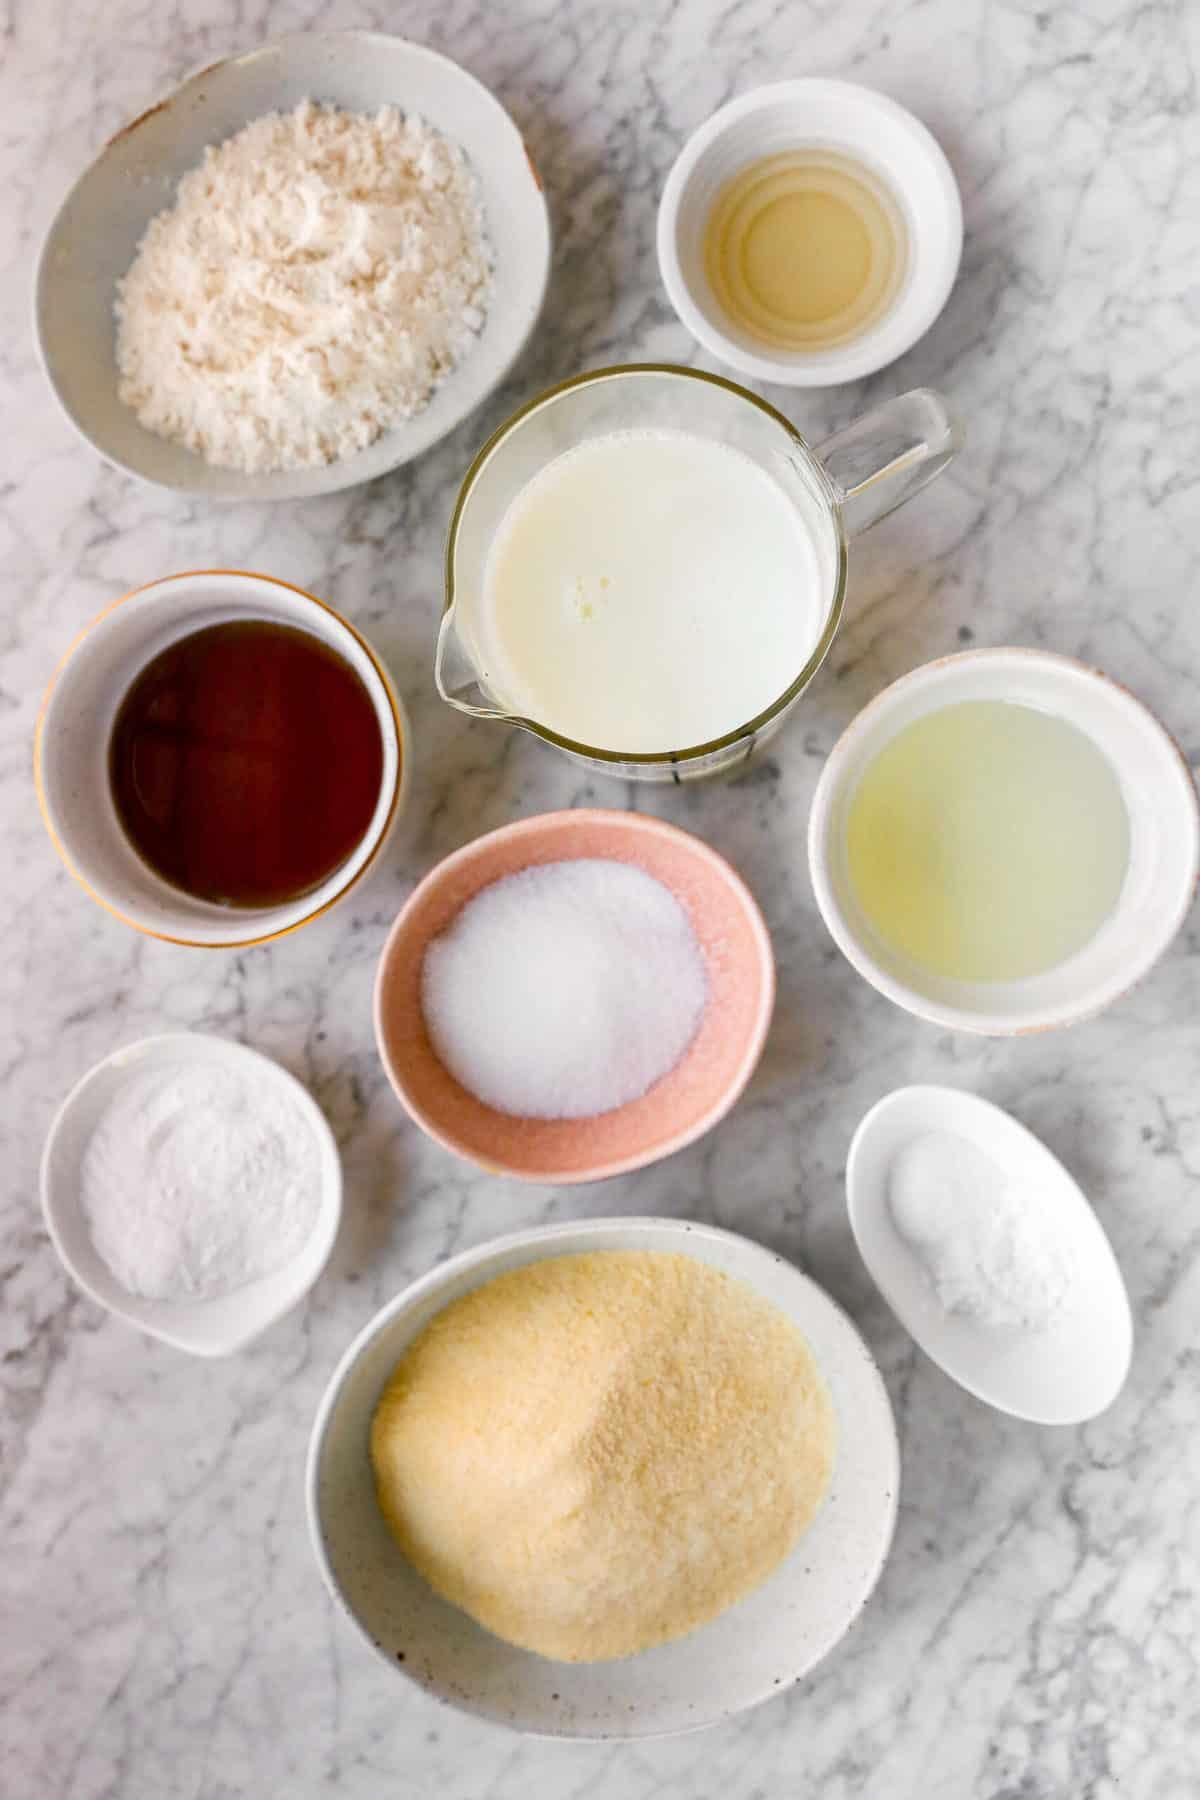 Ingredients for vegan cornbread.